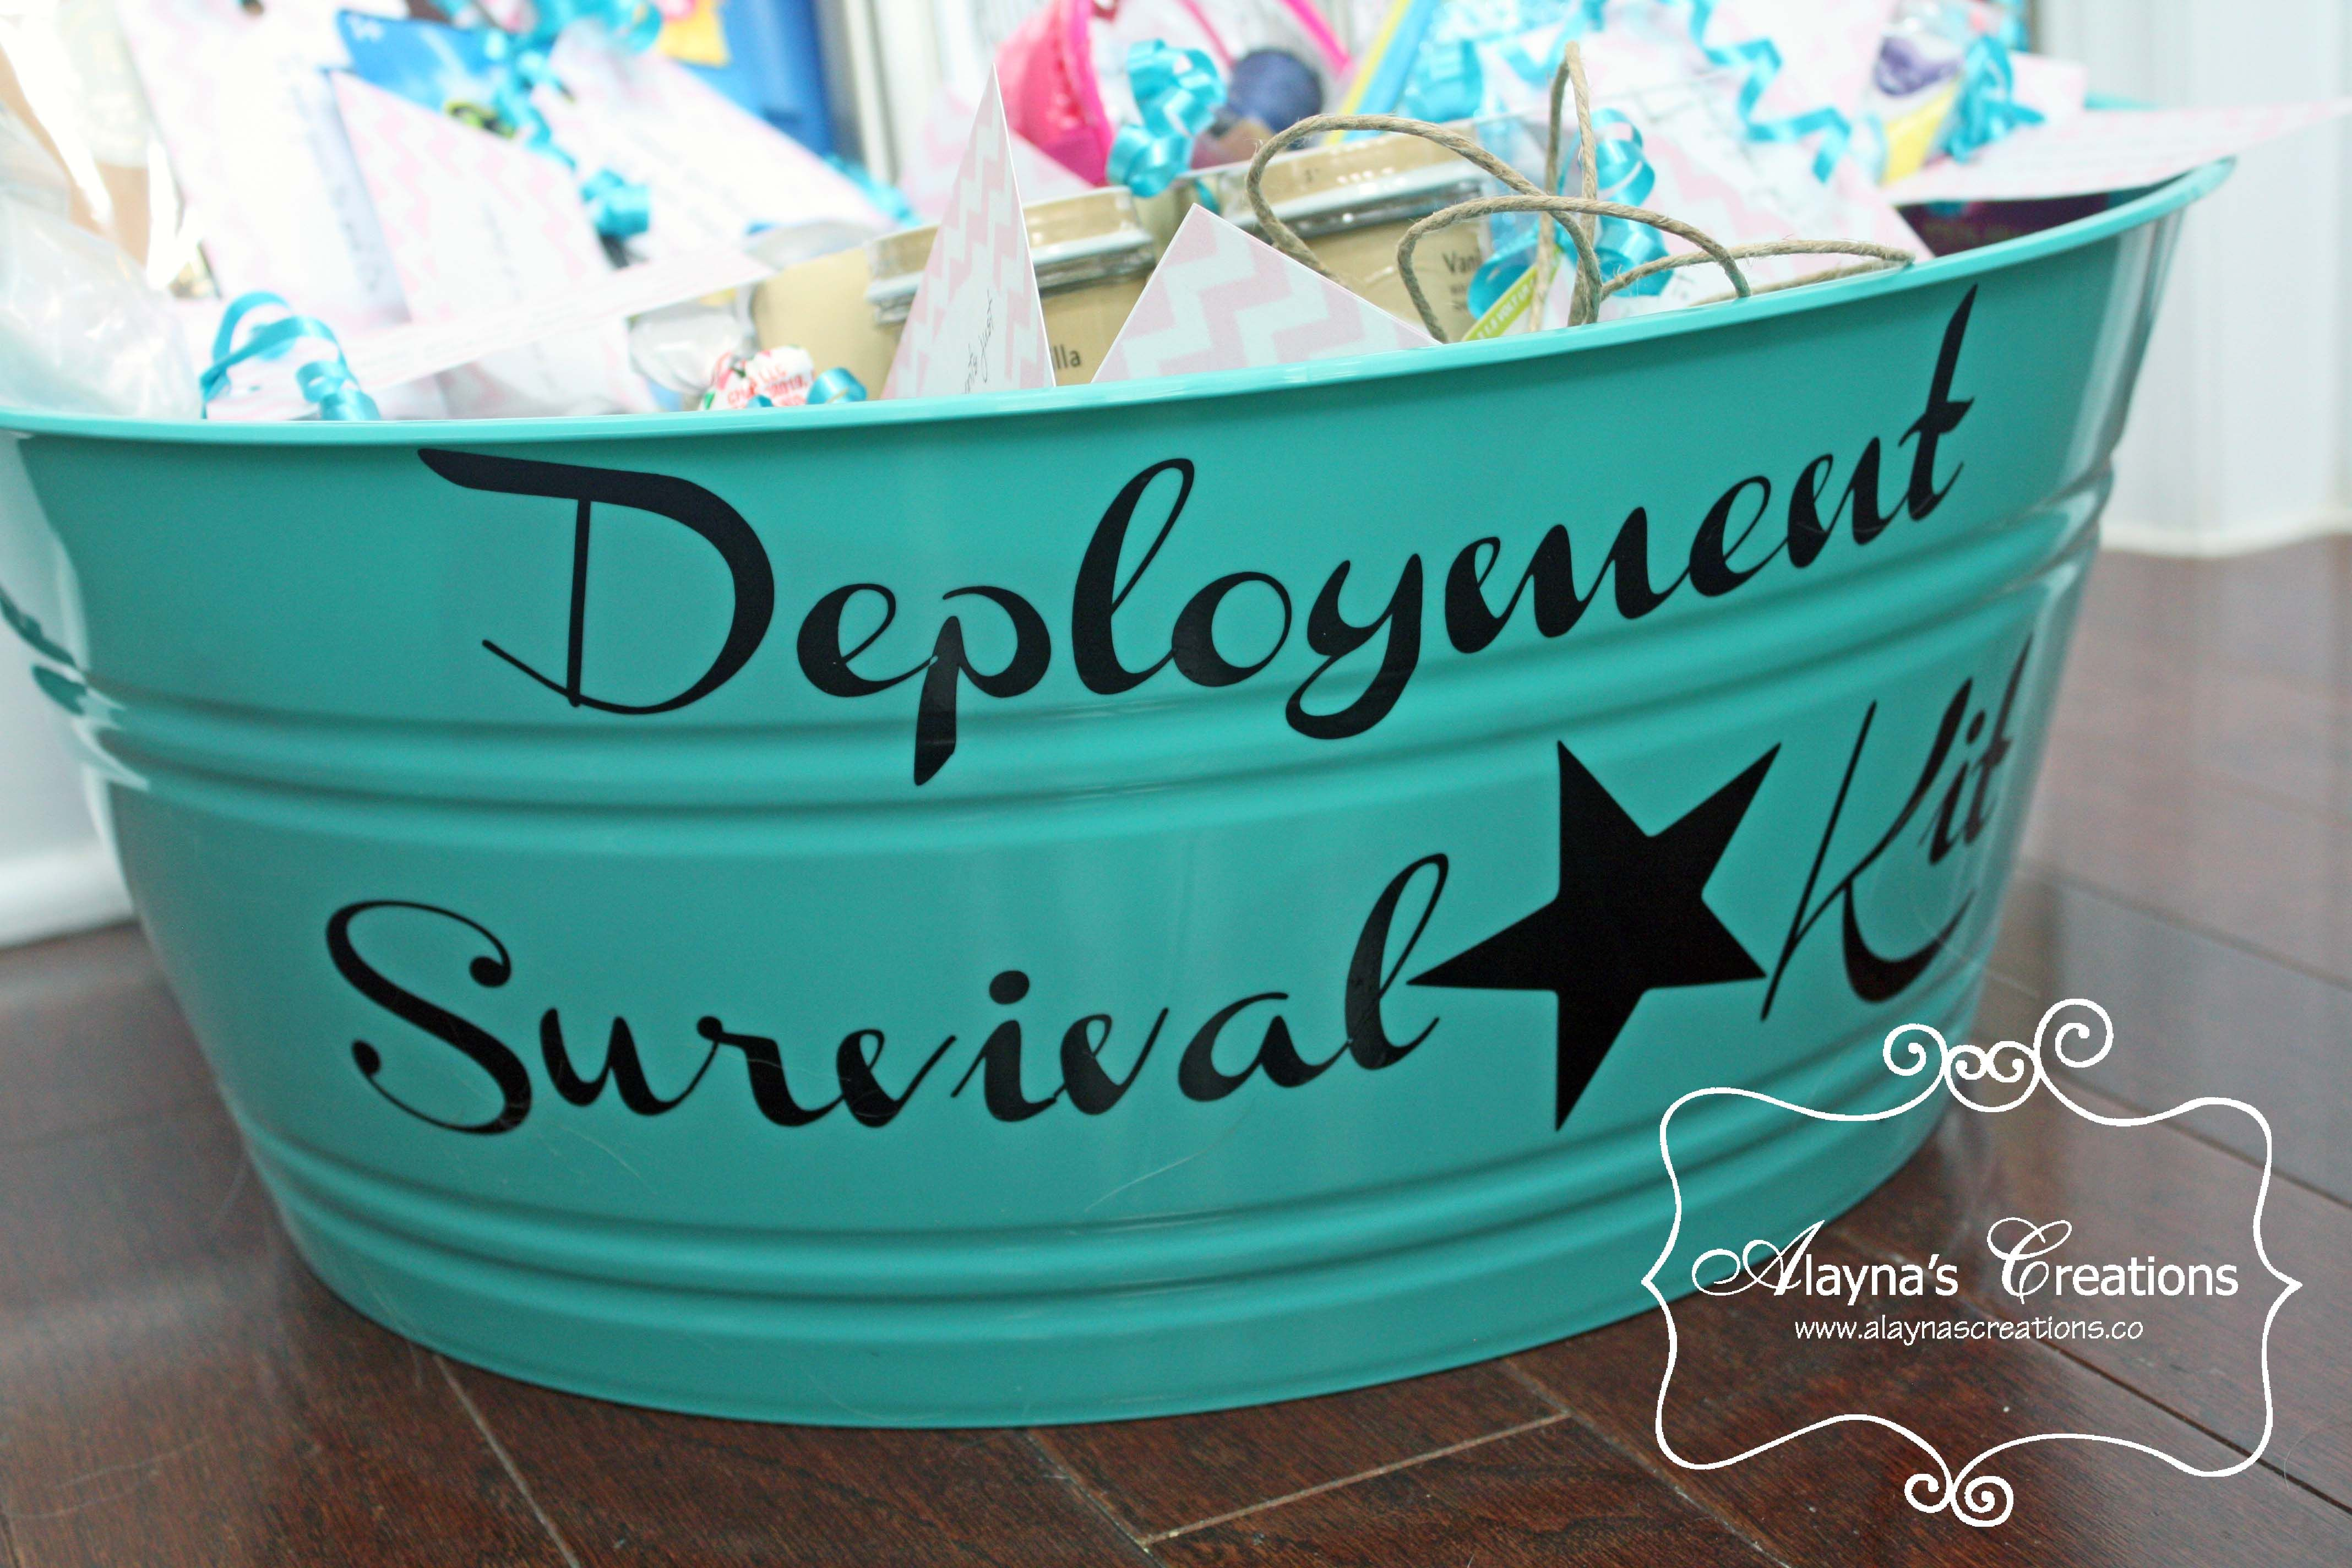 Deployment survival kit basket ideas survival kits and survival gift basket idea for spouse of a military member being deployed deployment survival kit negle Choice Image